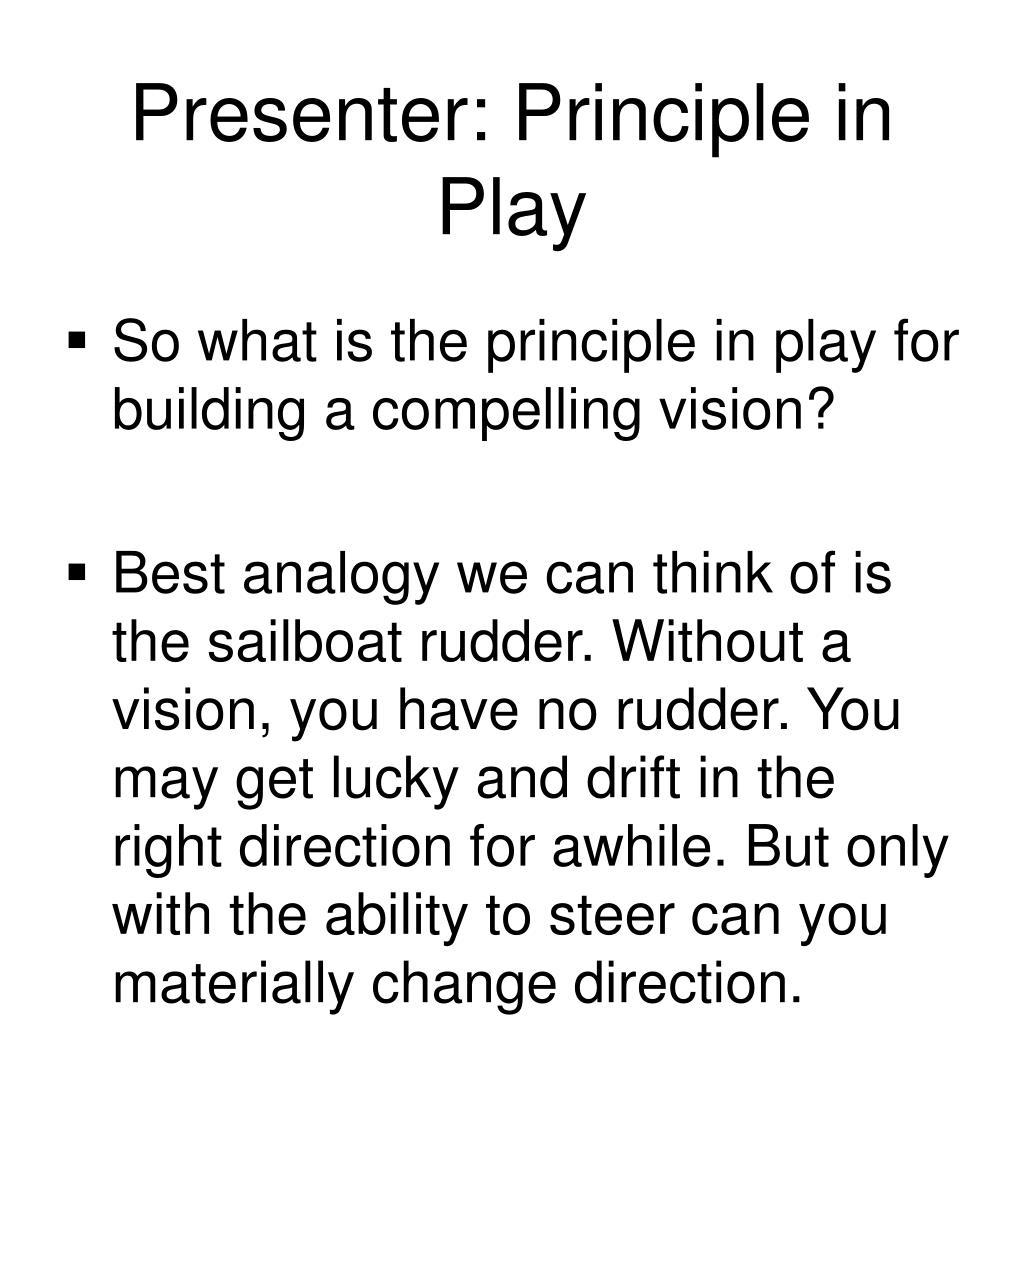 Presenter: Principle in Play